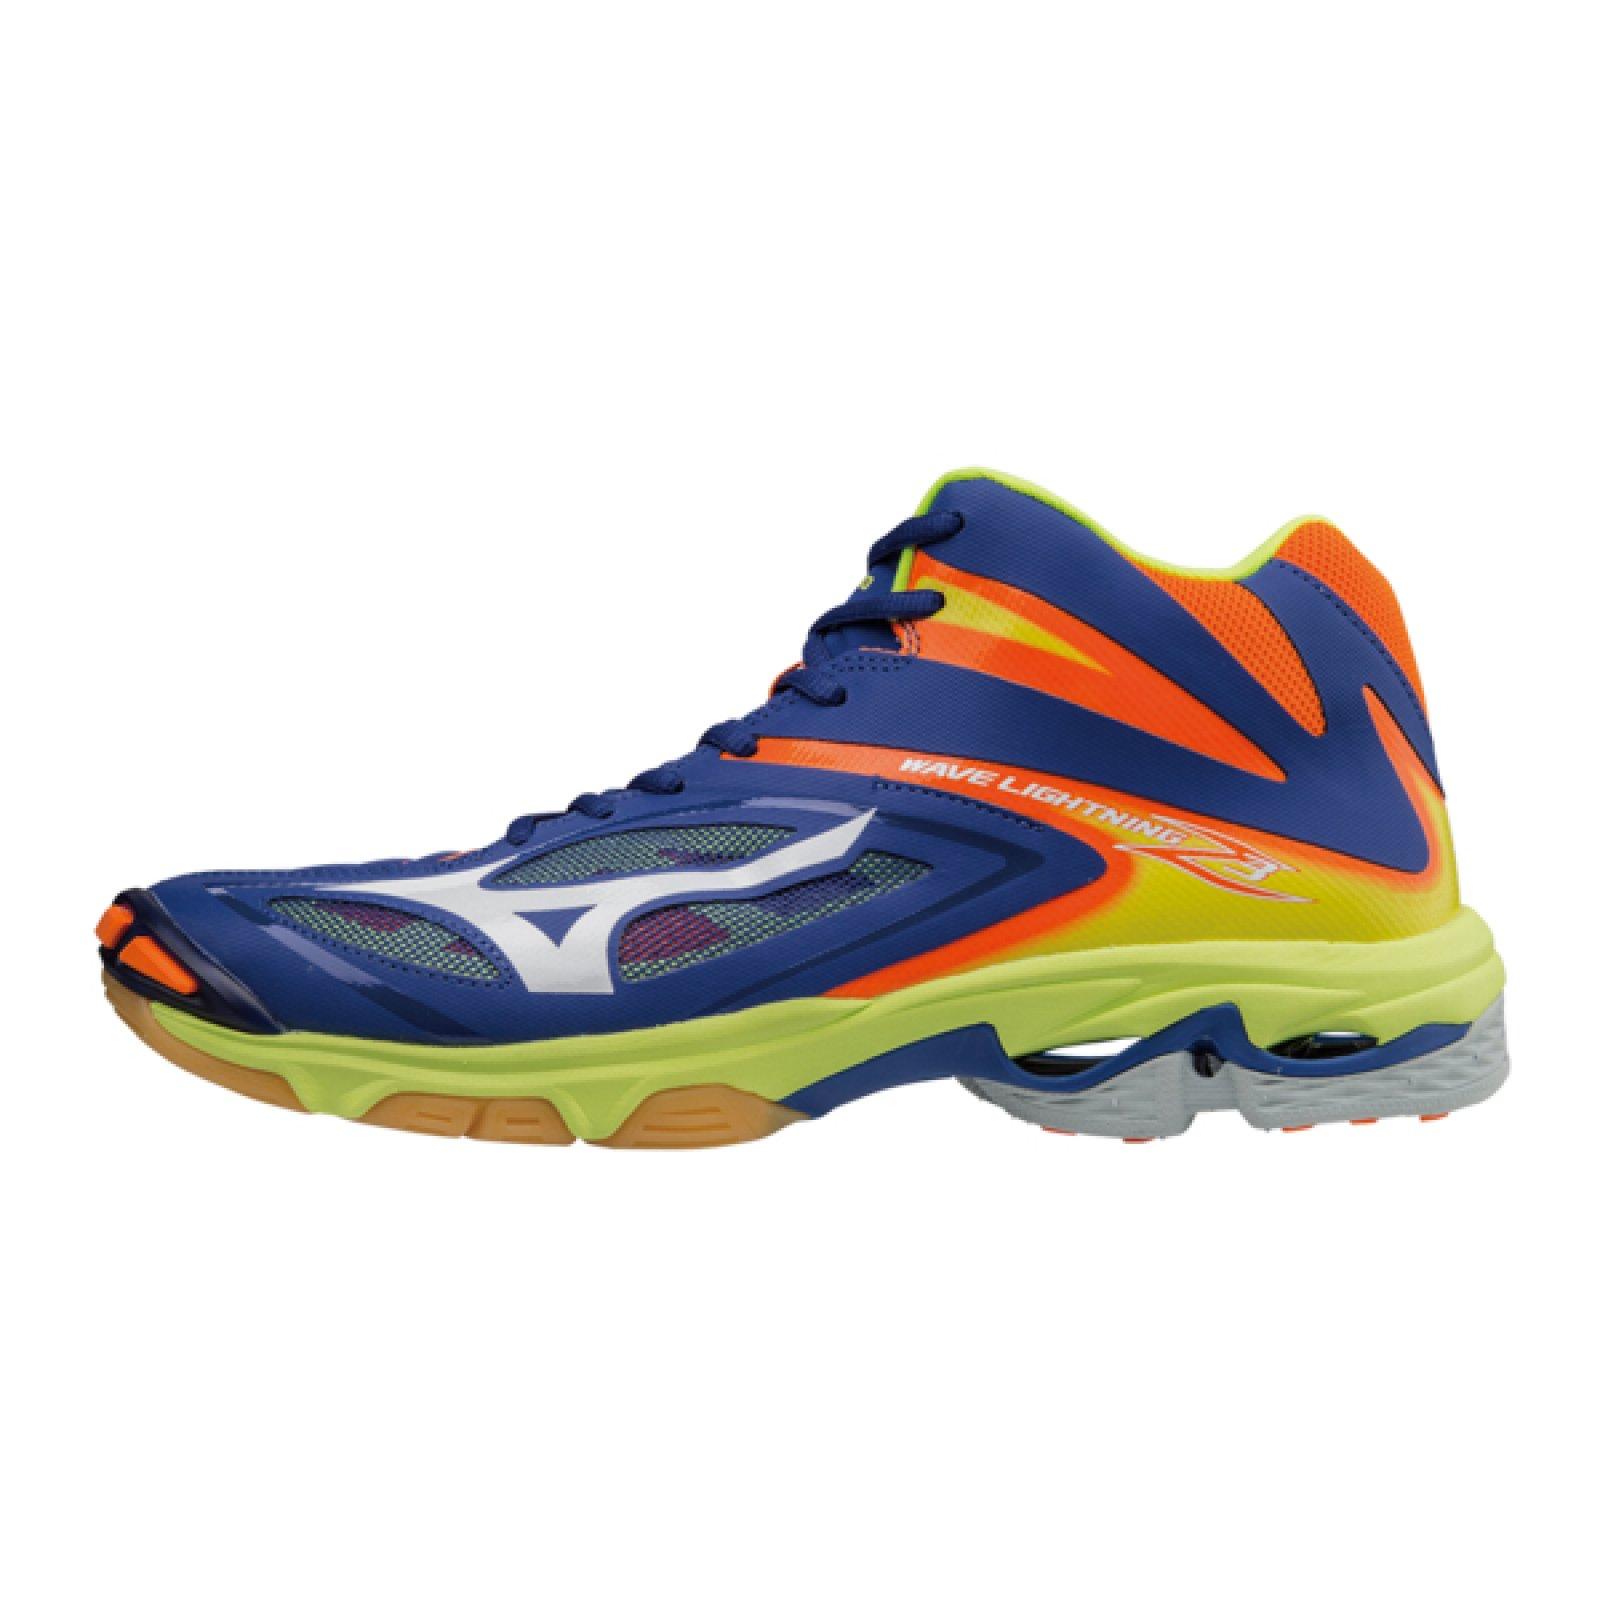 Volejbalové boty Mizuno Wave Lightning Z3 Mid U V1GA170573 ... 901b9460af